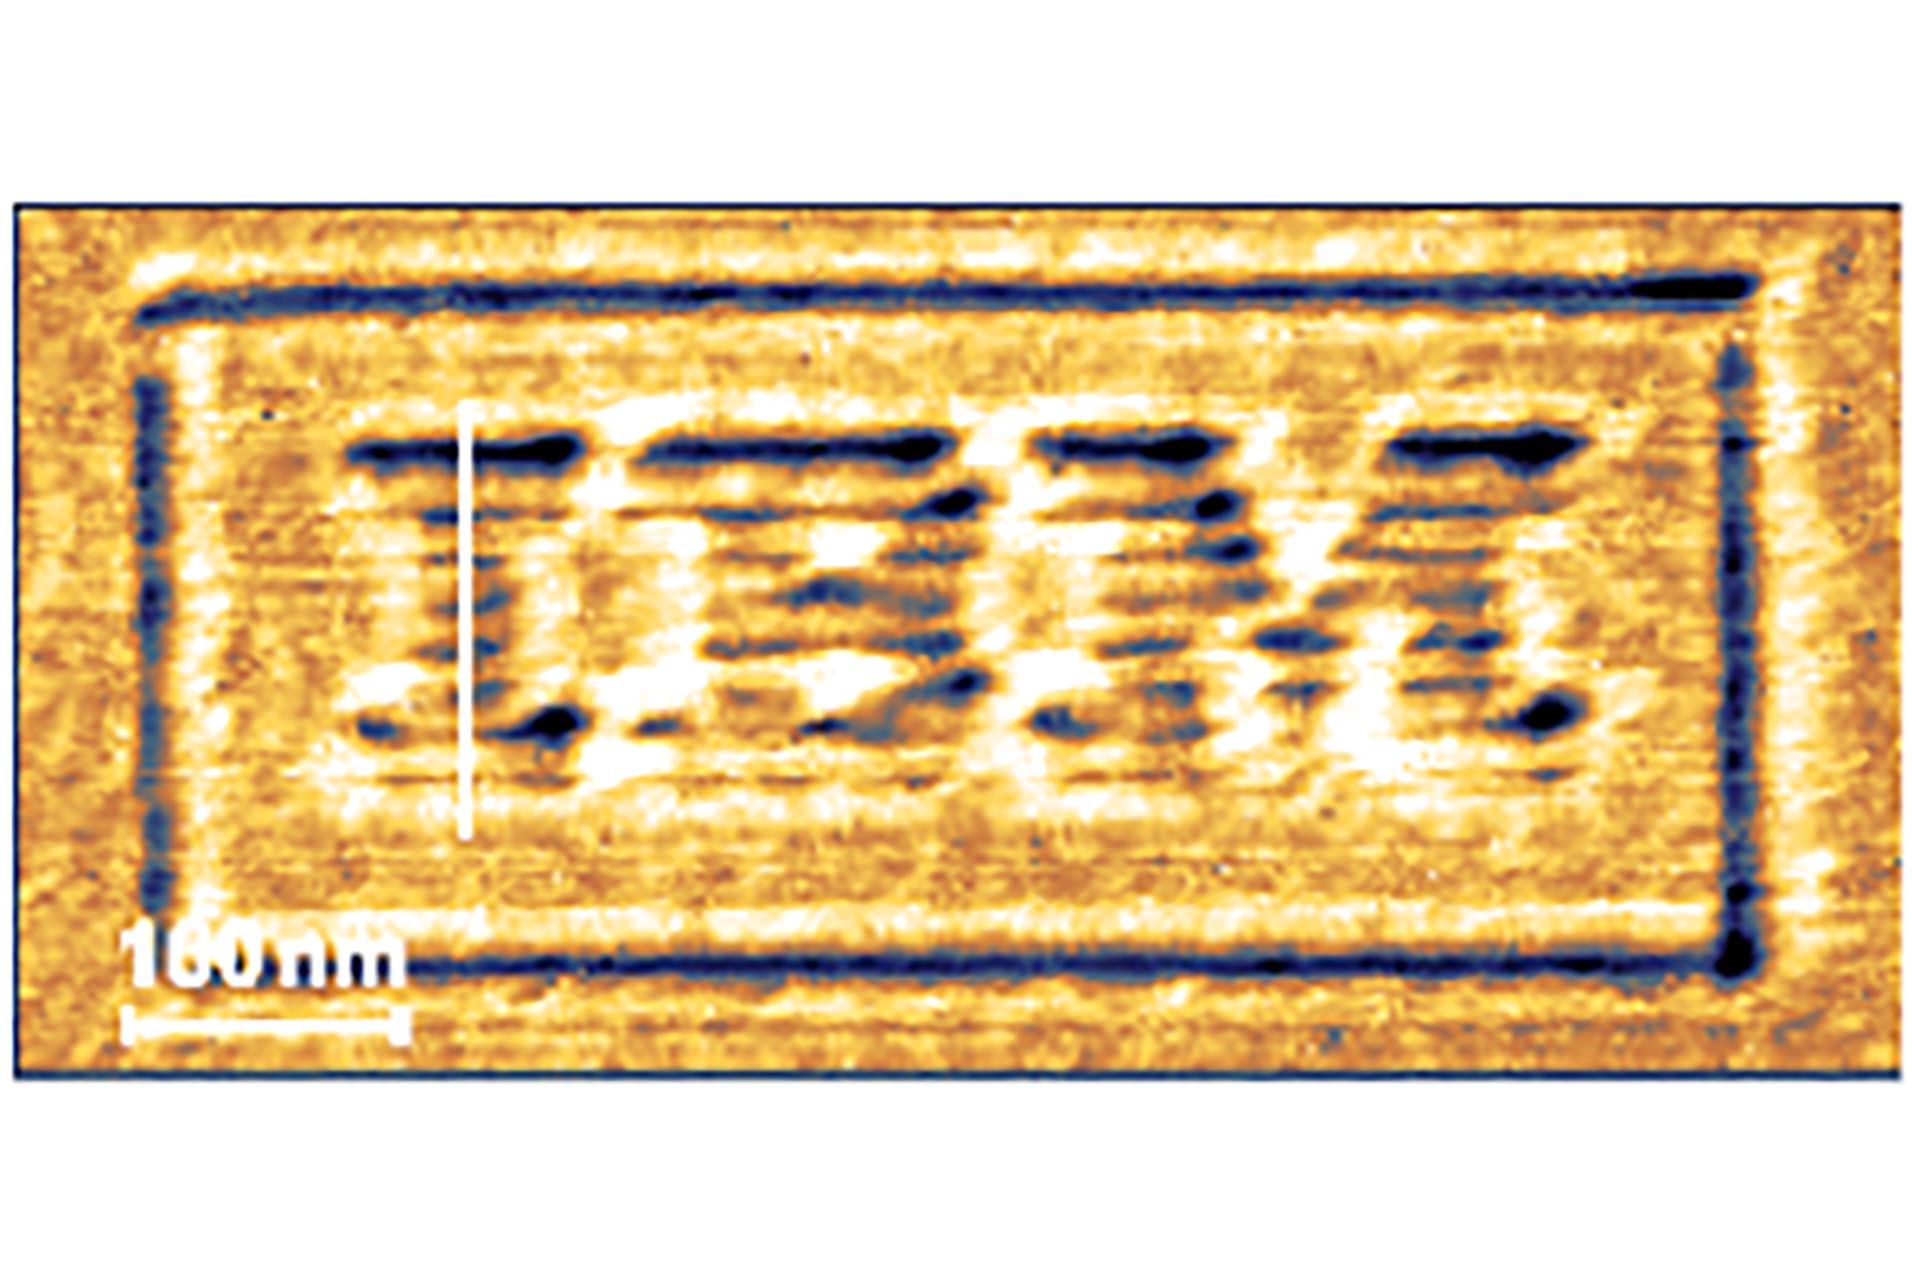 NanoFrazor AFM image of IBM logo written 4 nm deep into PPA resist with 8 nm half-pitch resolution.